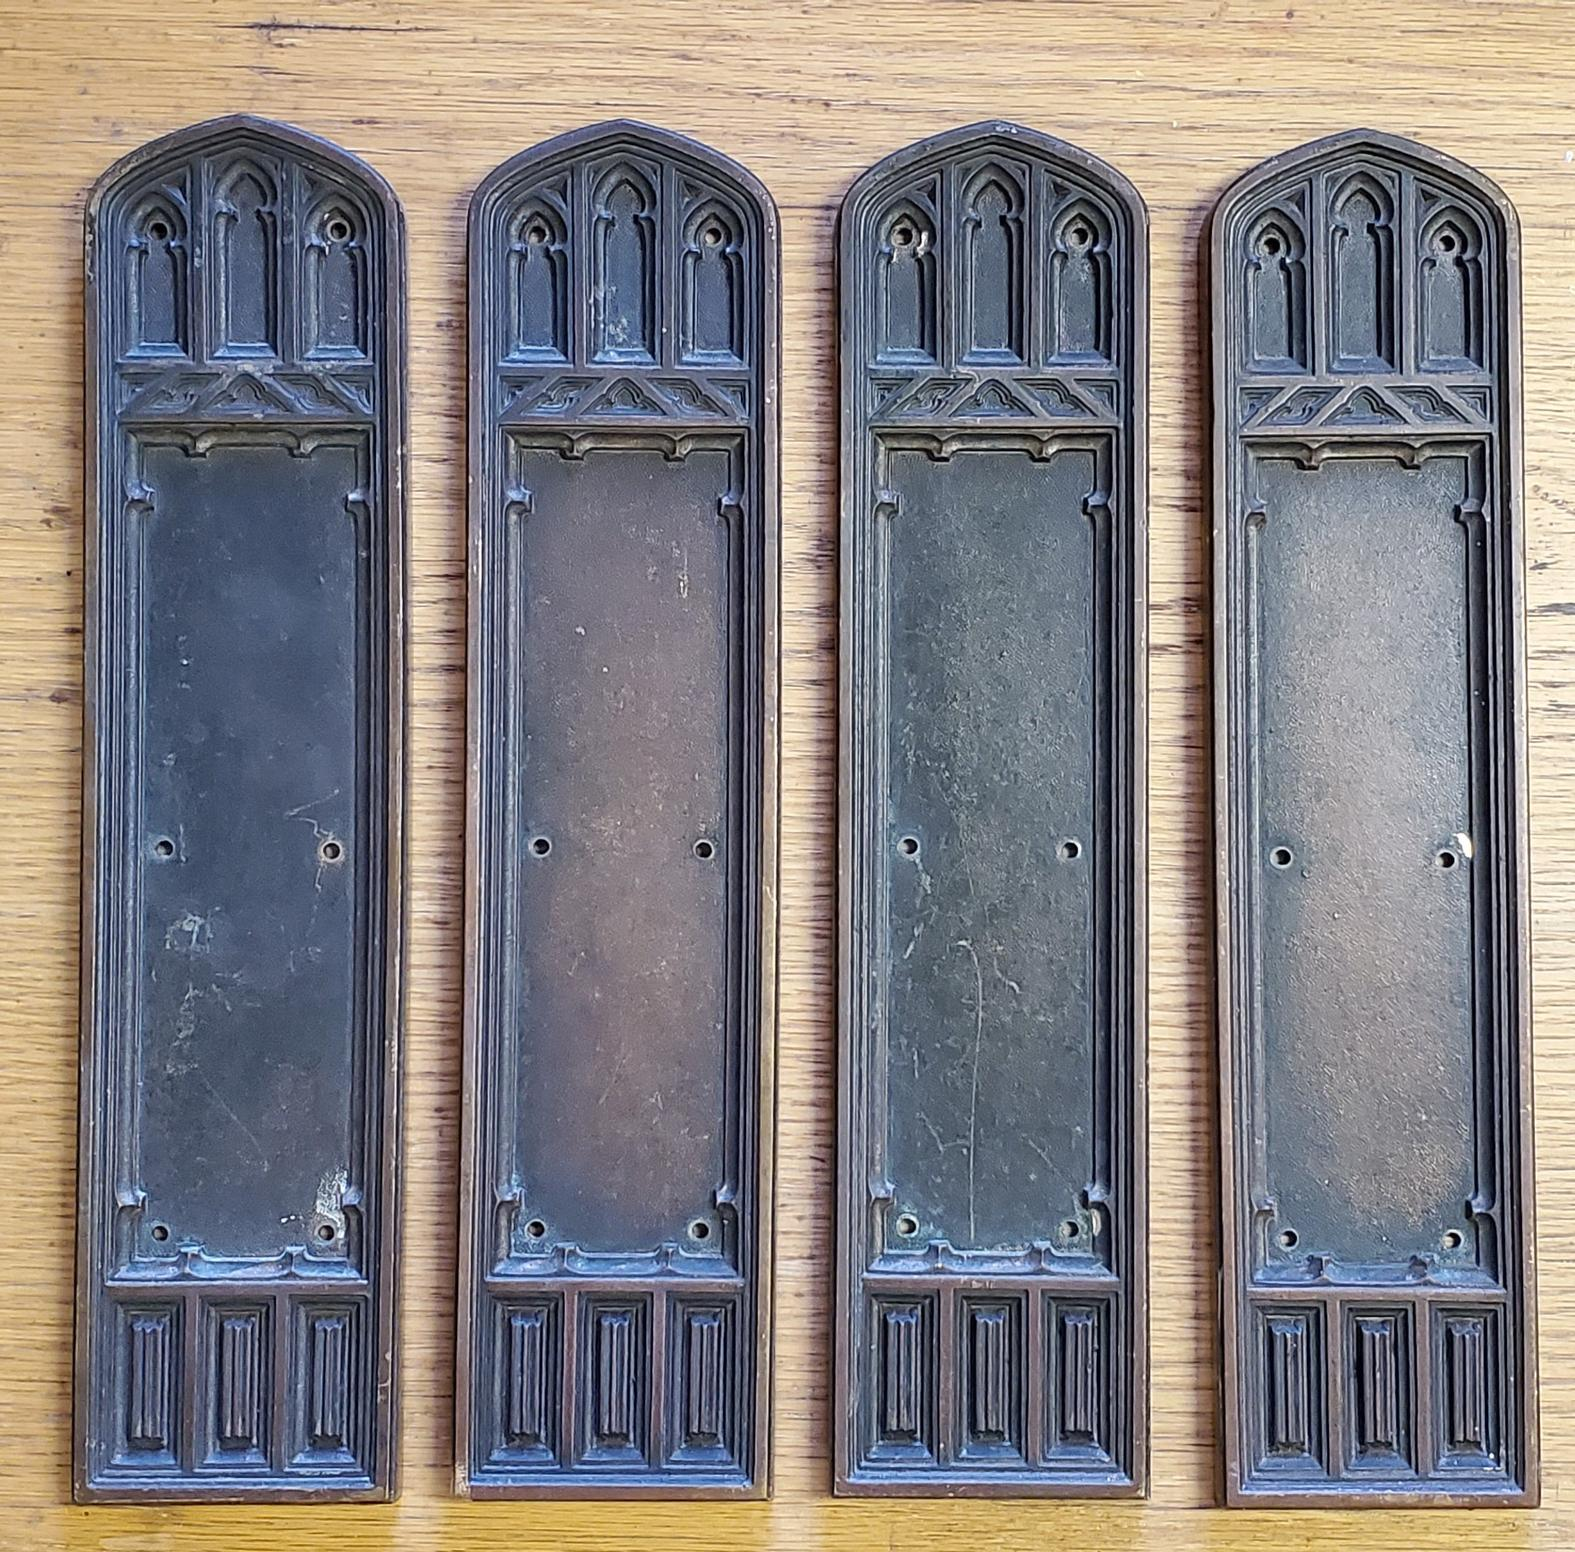 Gothic Push Plate-s Door Hardware